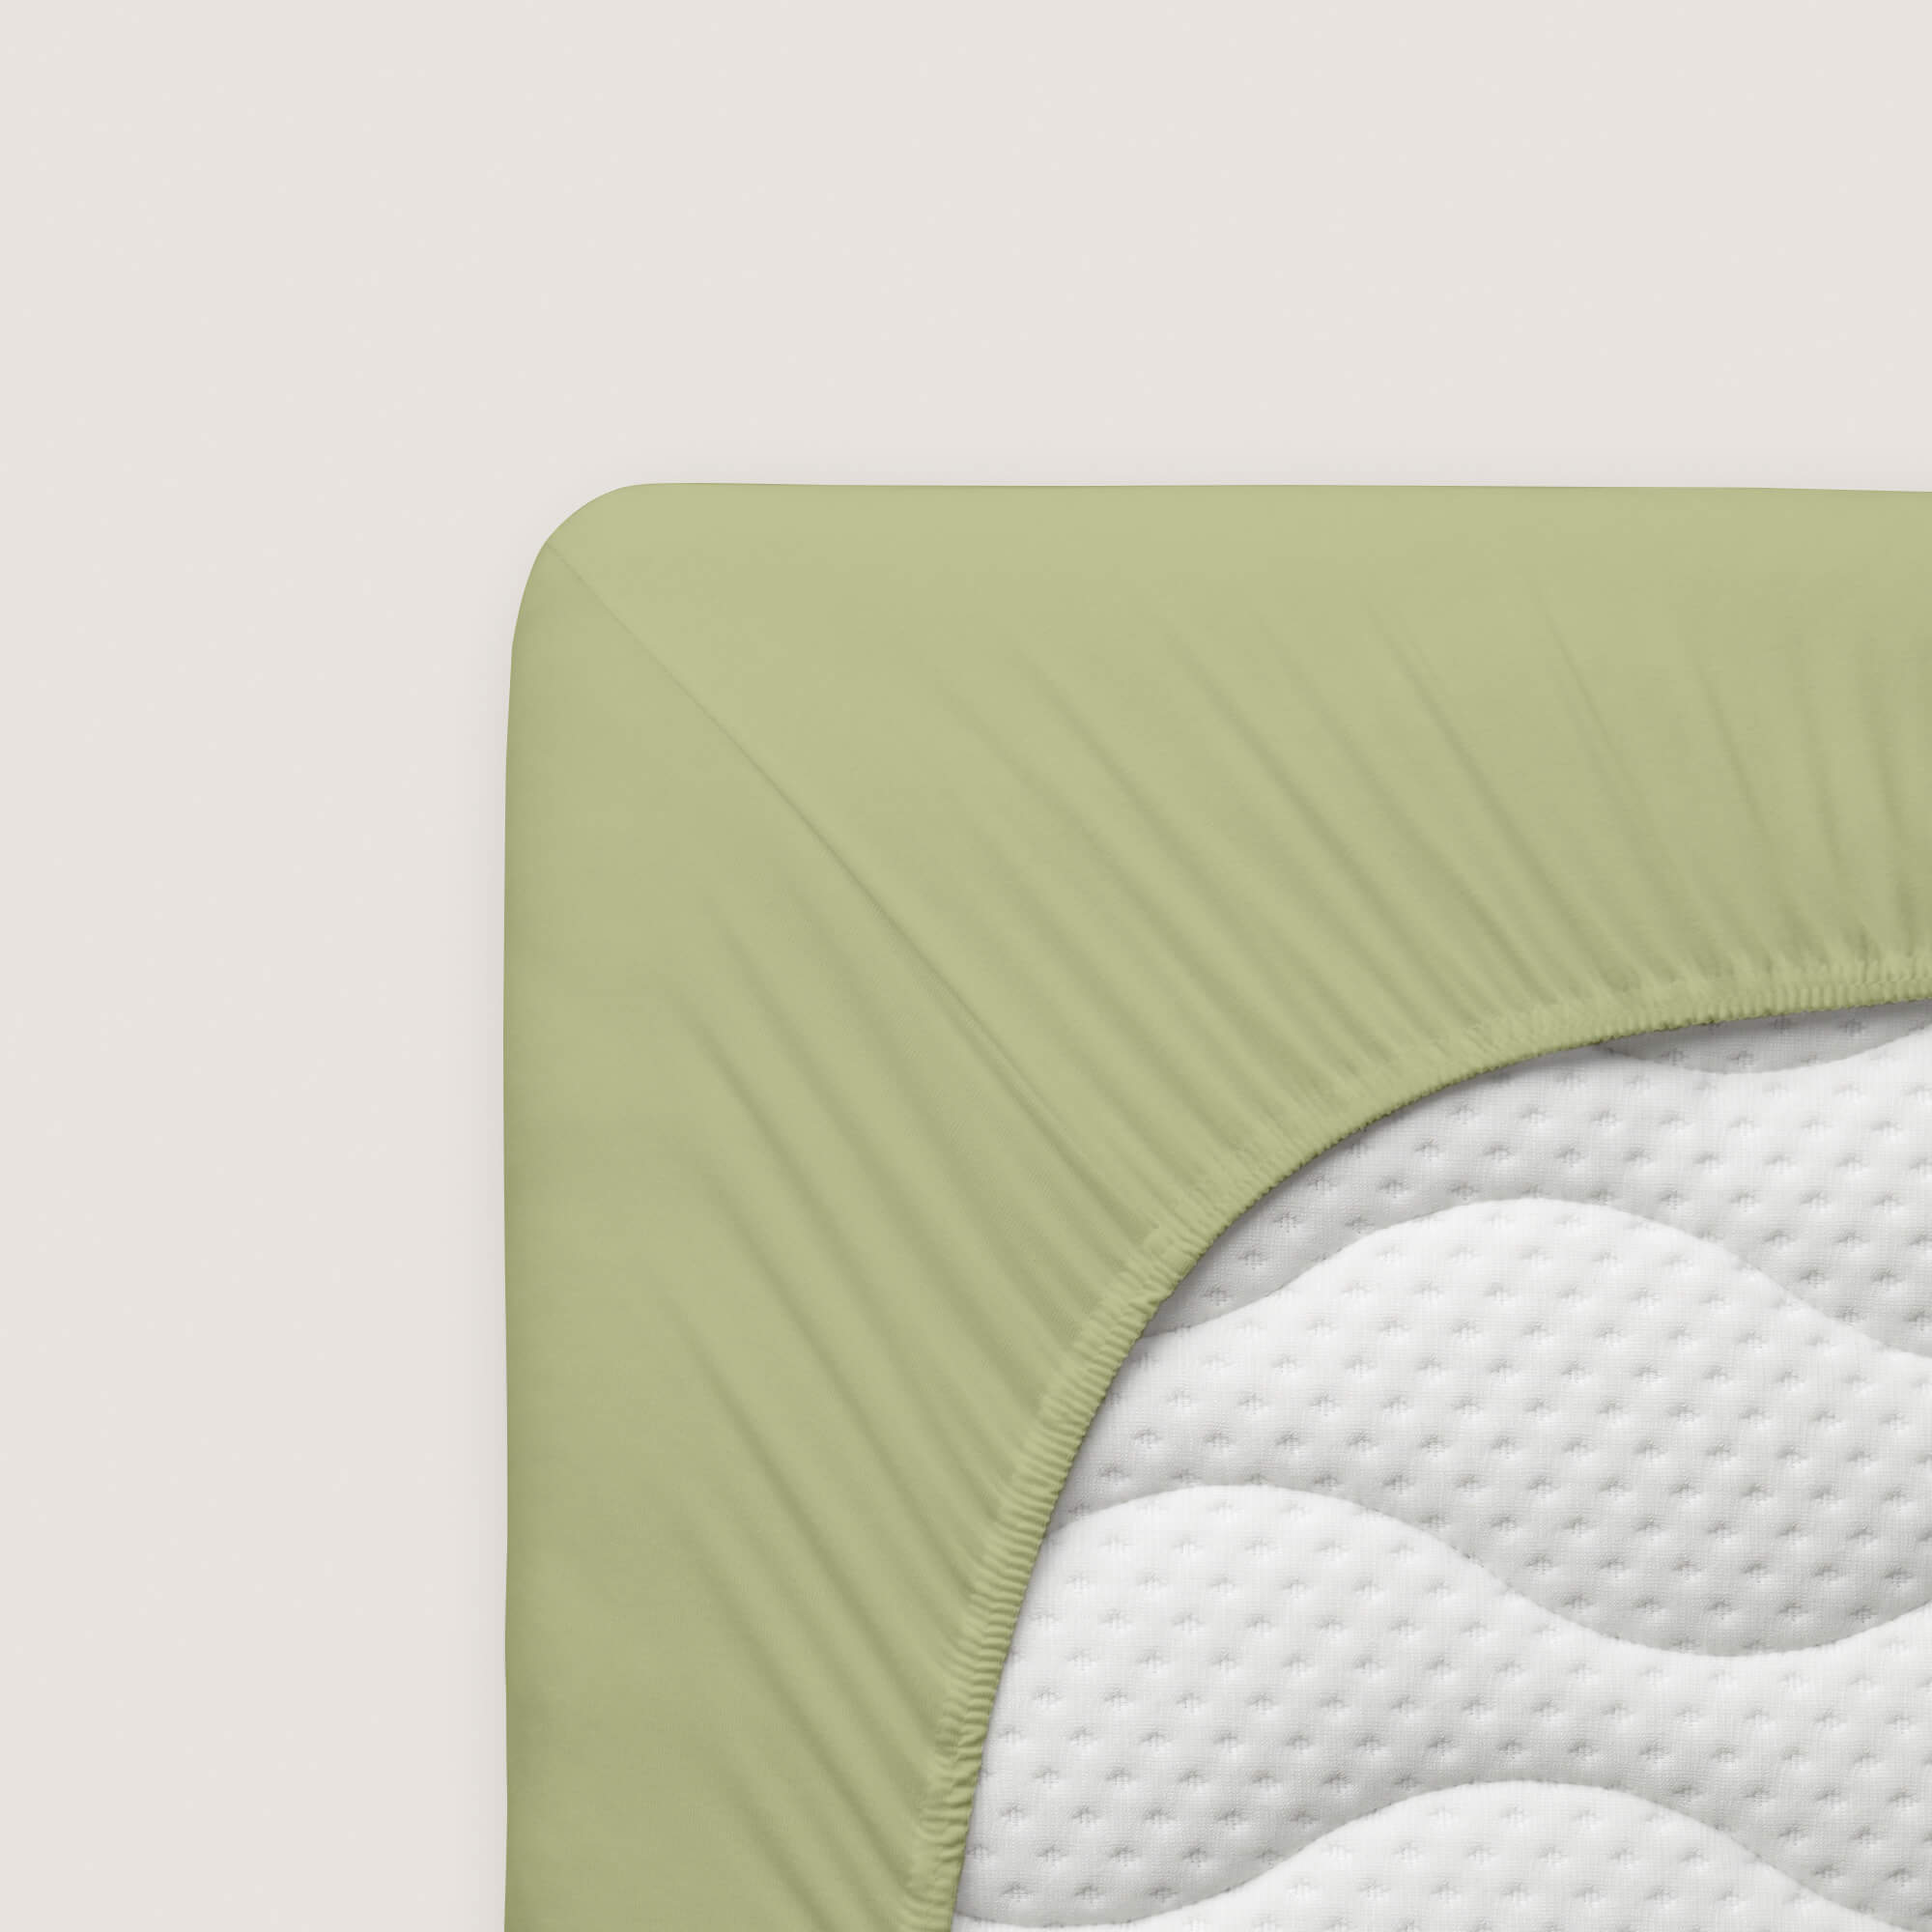 grünes schlafgut Spannbettlaken Mako Jersey aus Baumwolle